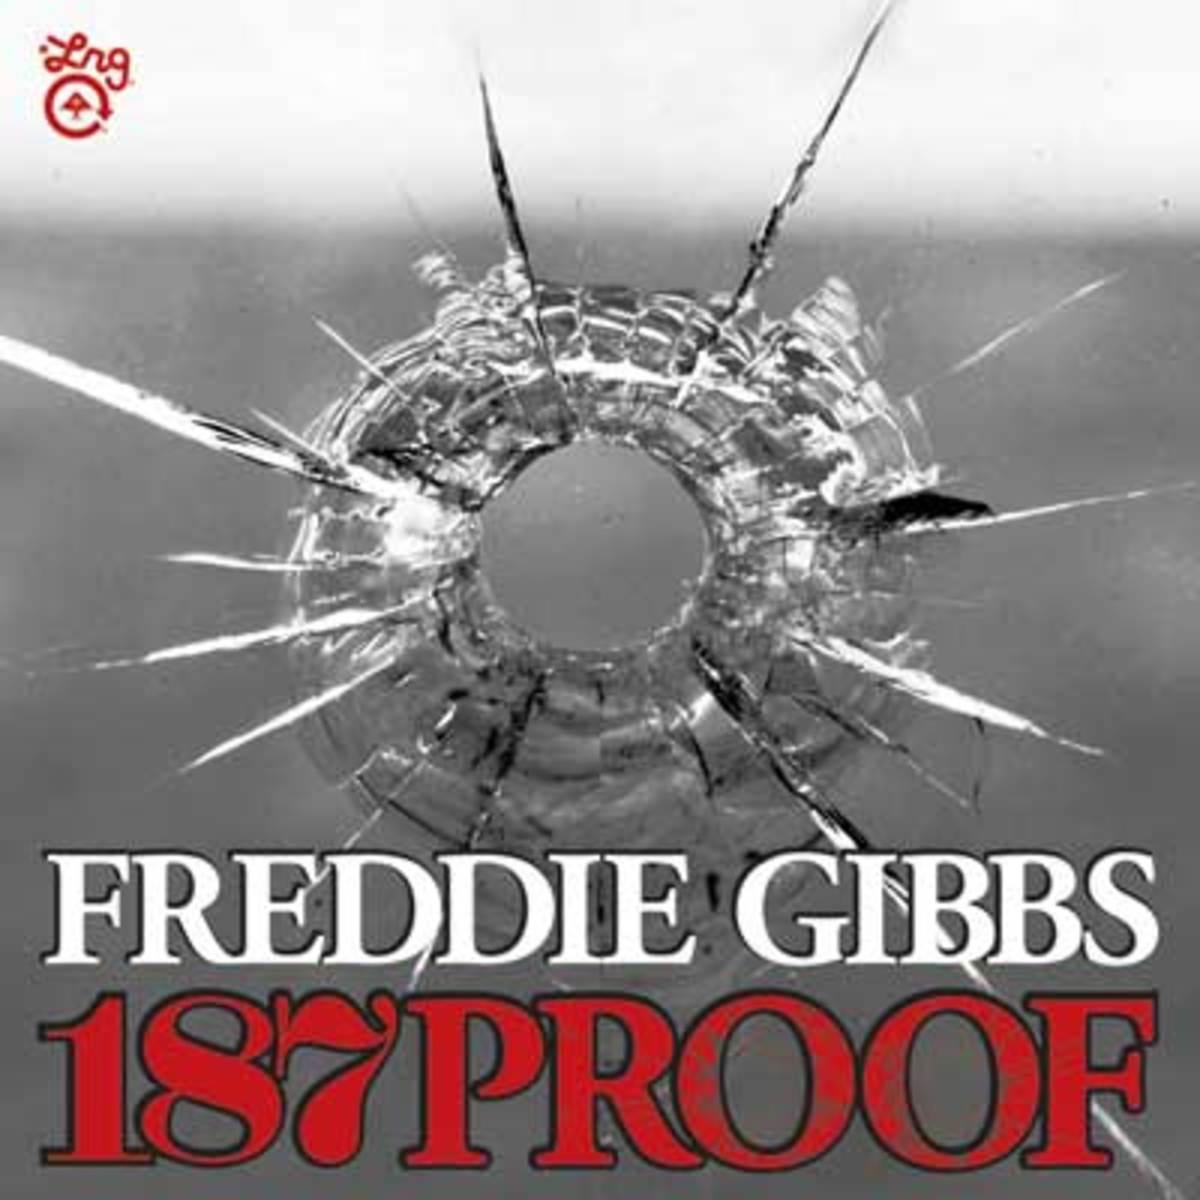 freddiegibbs-187proof.jpg